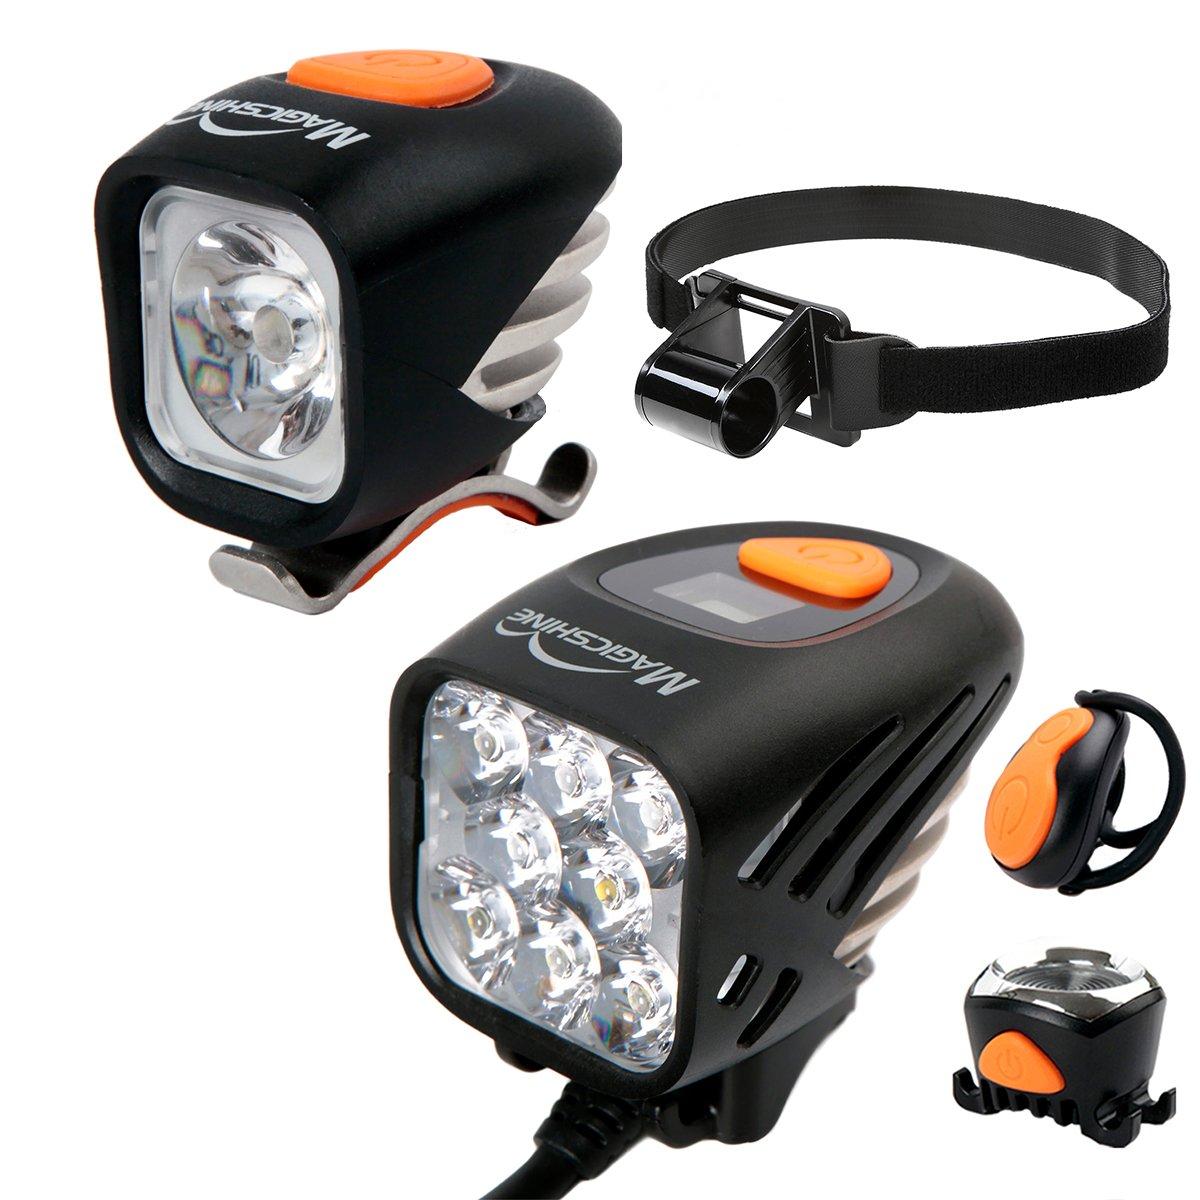 Magicshine Ultimate Mountain Bike Light Bundle Deals MJ-908 MJ-900 MJ-6058, 8000 Max Lumen Mountain Bike Headlight, 1200 Lumen CREE headlamp with Helmet Strap Enduro Trail Offroad